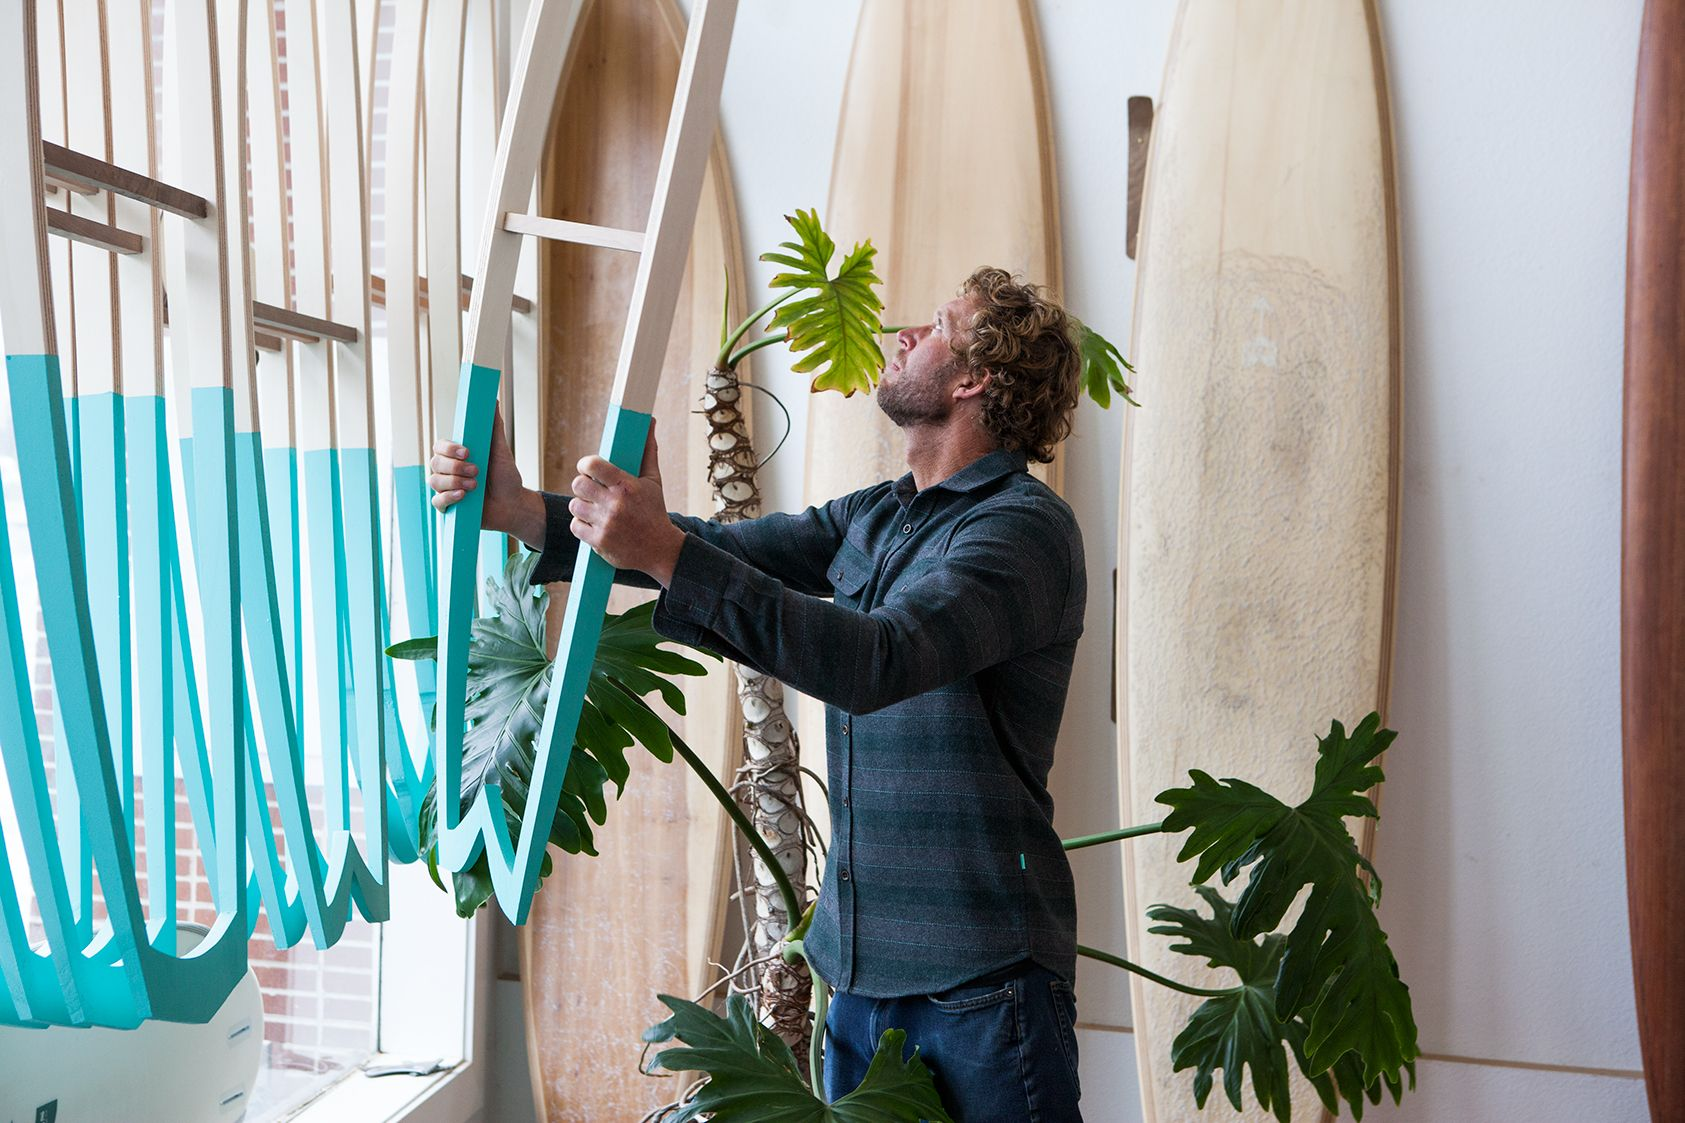 Vissla Holiday 2014 Collection   Danny Hess   Photo: Kenny Hurtado #vissla #creatorsandinnovators #surf #apparel #ugeneflannel #holiday #wovens #dannyhess #kennyhurtado